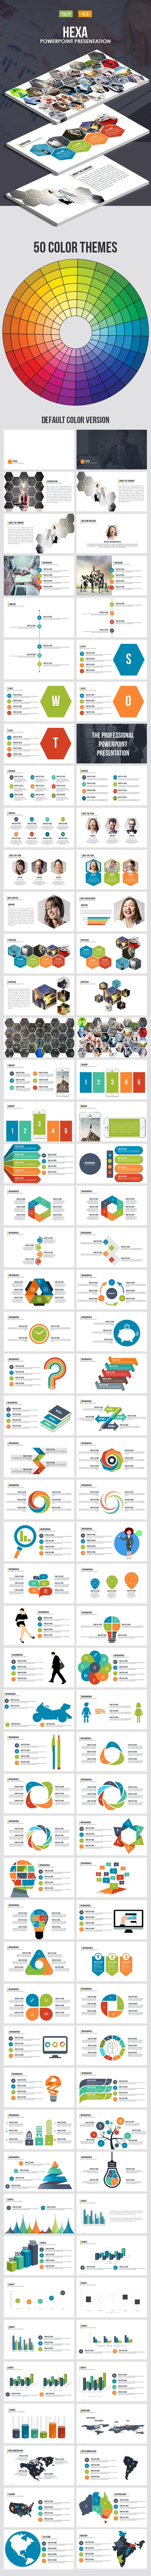 Hexa - Multipurpose Powerpoint Template